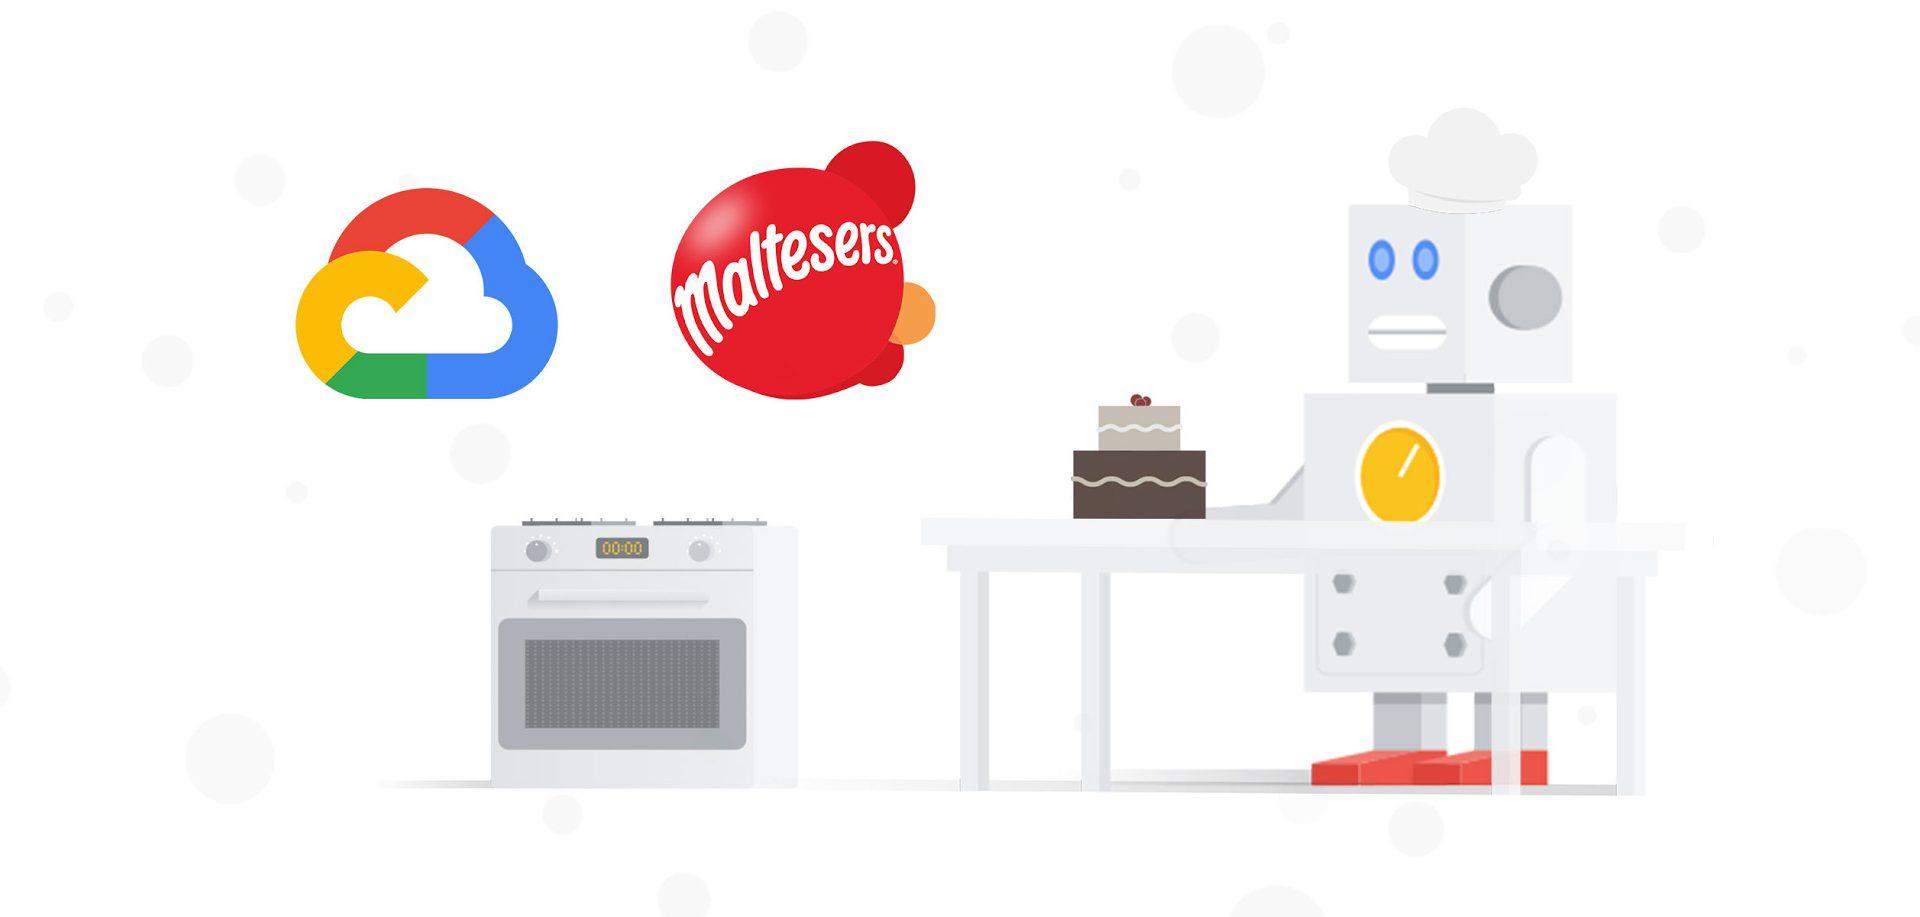 Google Cloud | Maltesers